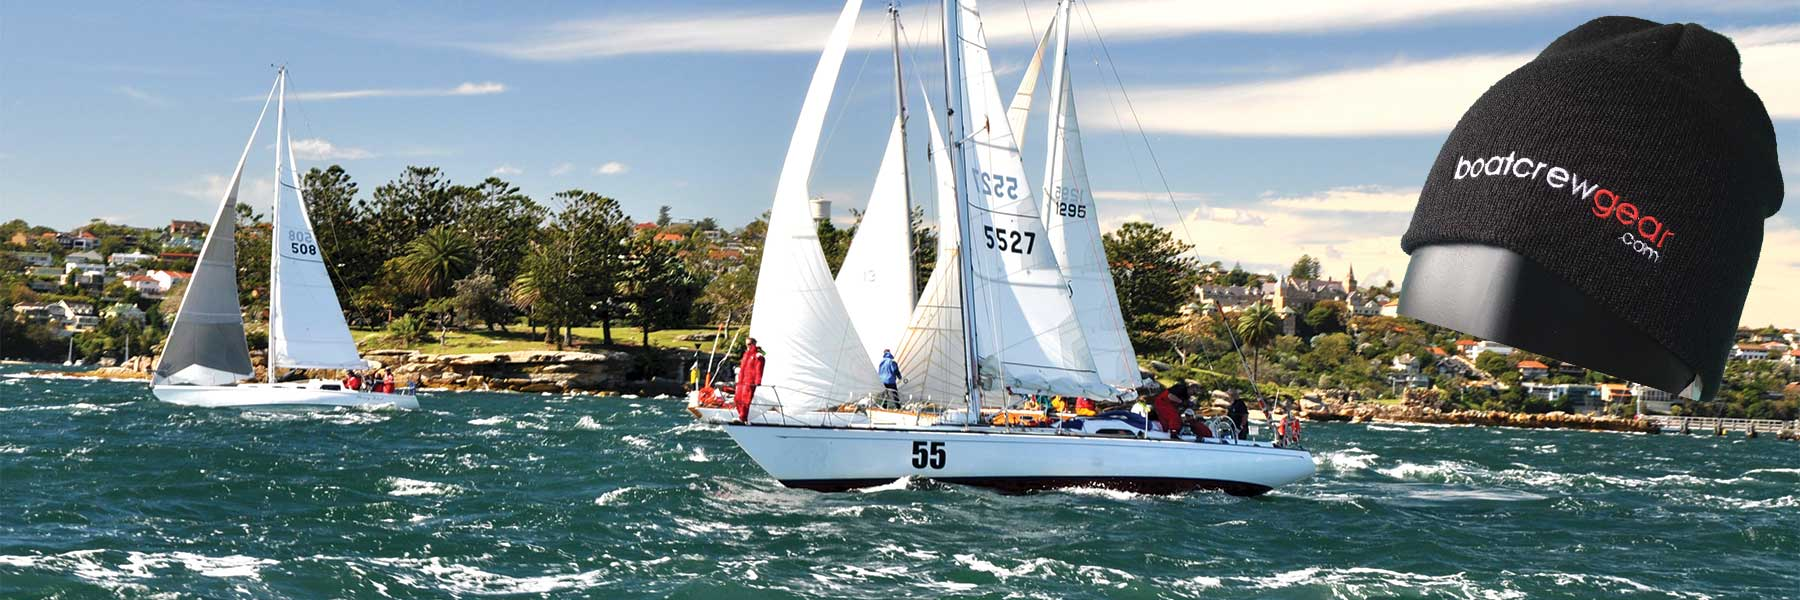 Sailing Gear Boating Paddling Boarding Windsurfing Boat Crew Harness For Sailboat Boatcrewgear Beanie